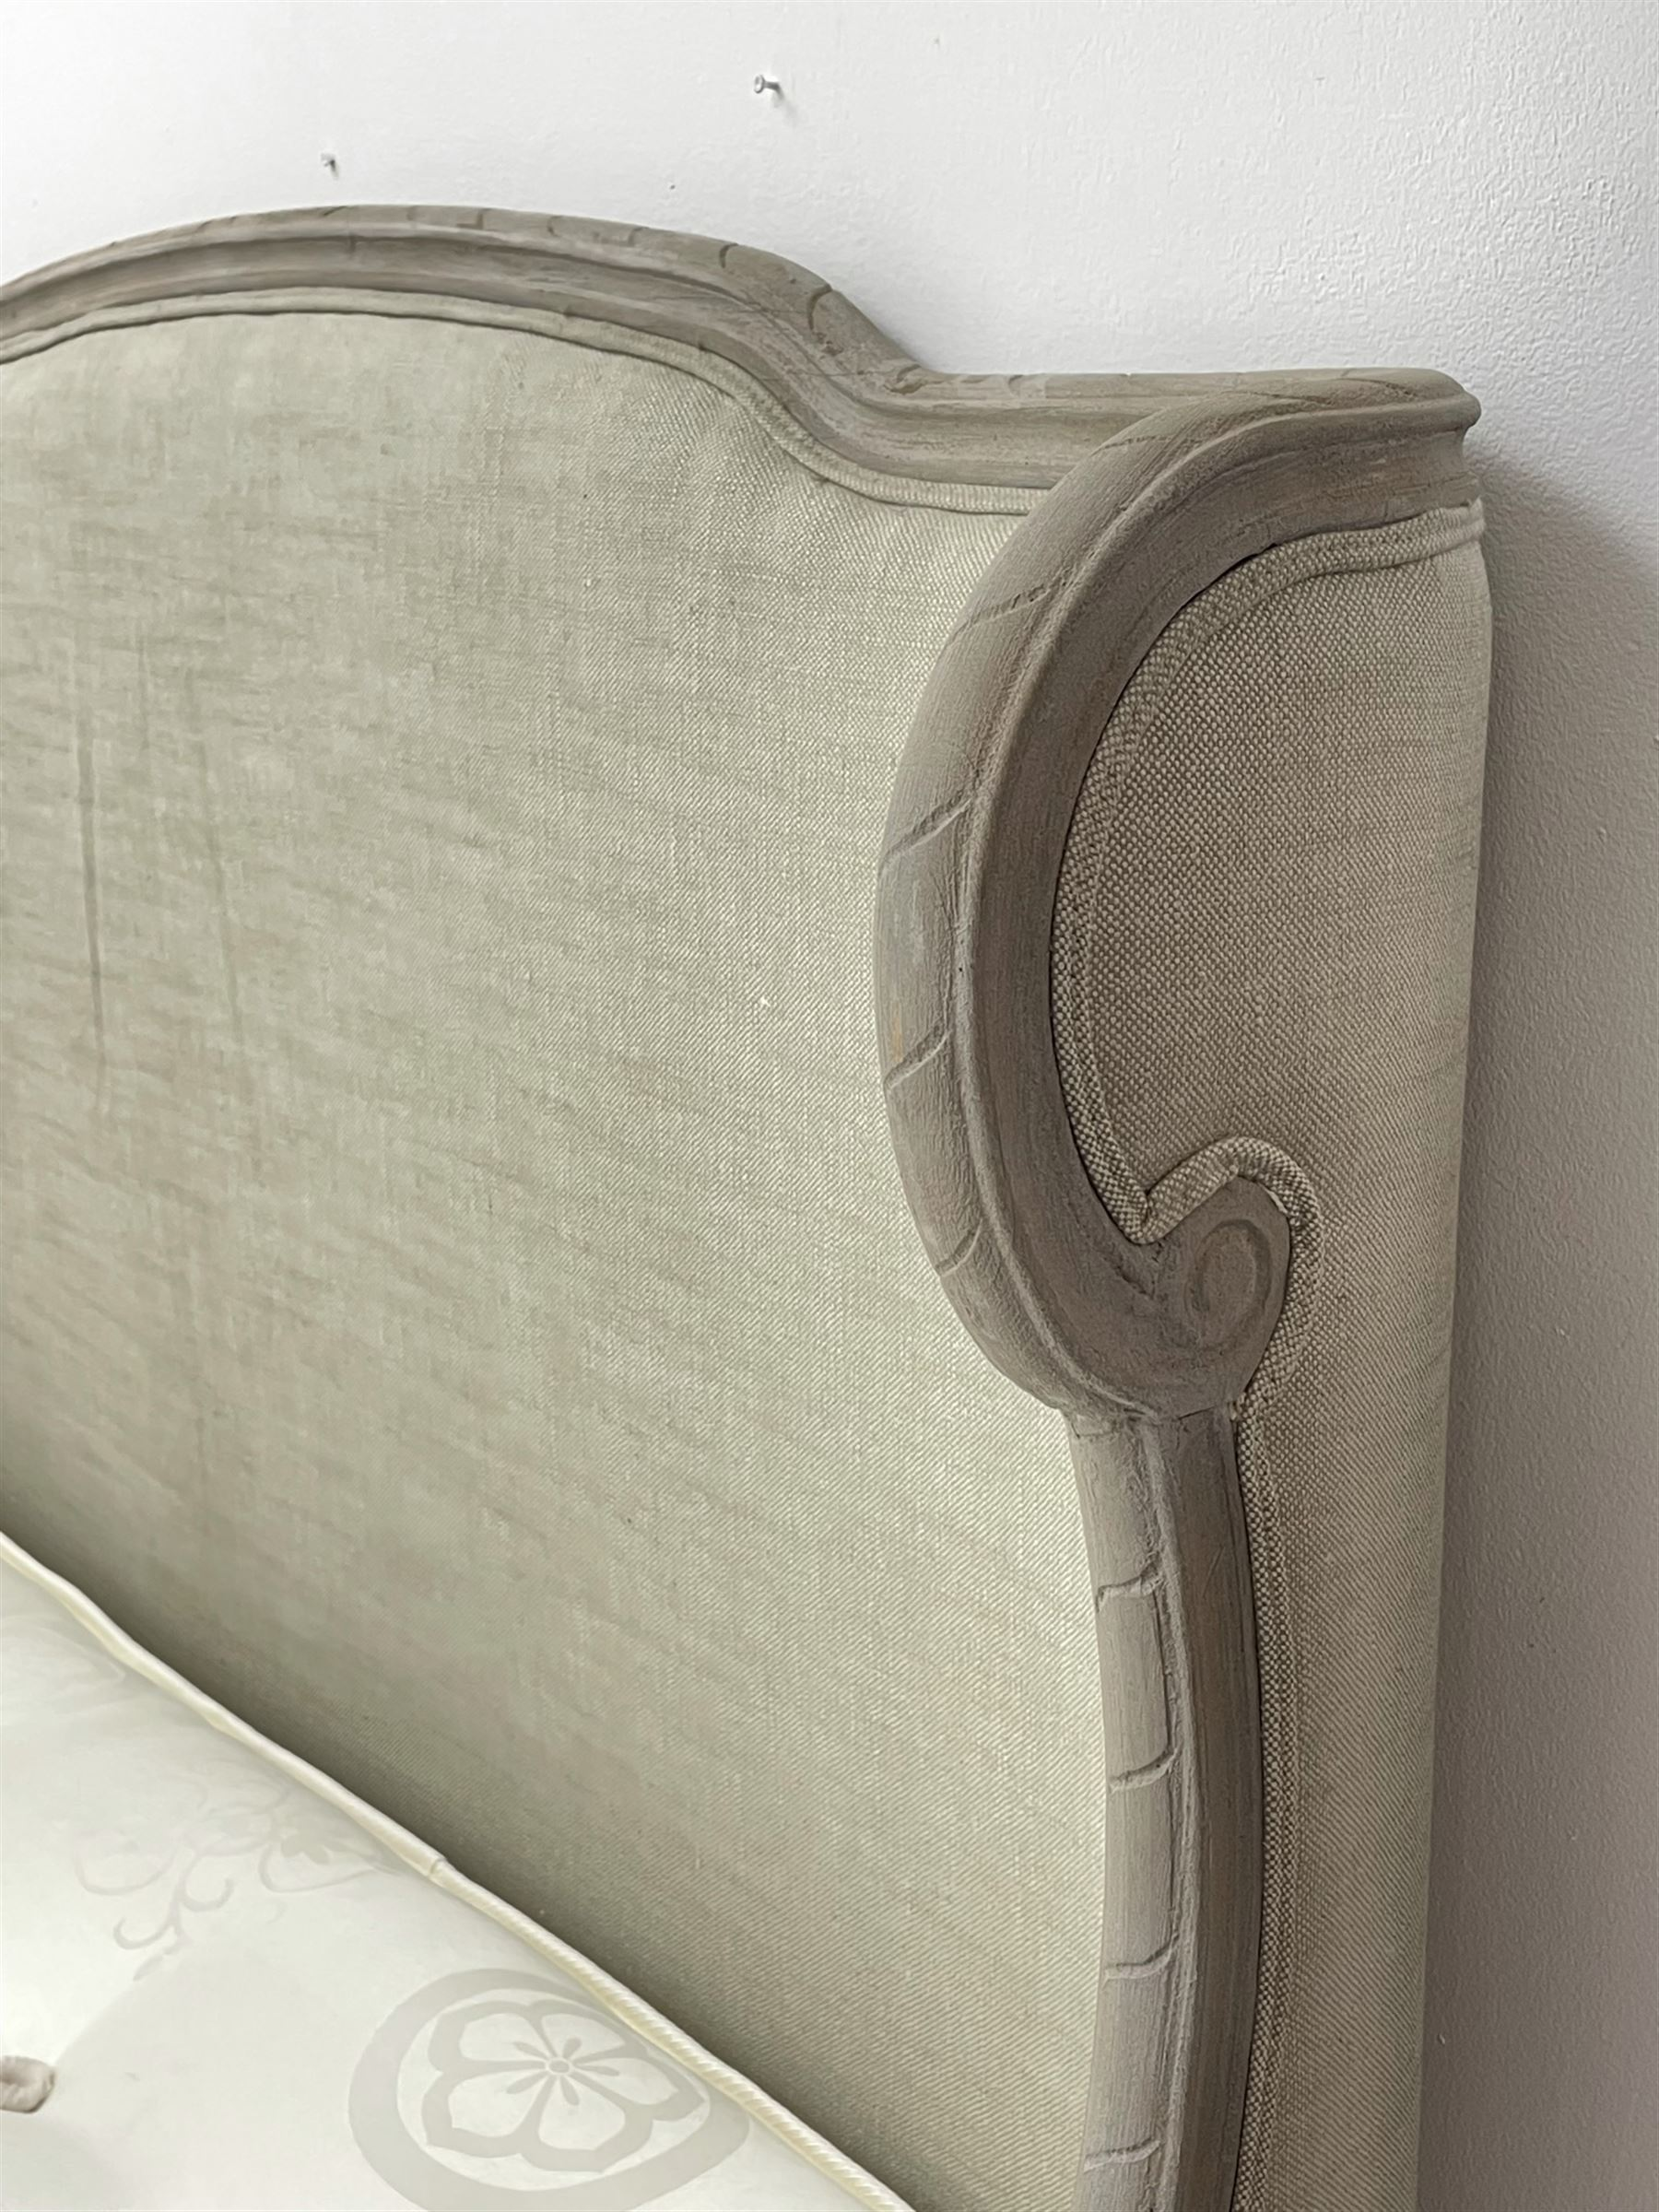 Graham & Green Evelyn - French style Kingsize 5' bedstead upholstered in natural light grey linen - Image 6 of 6